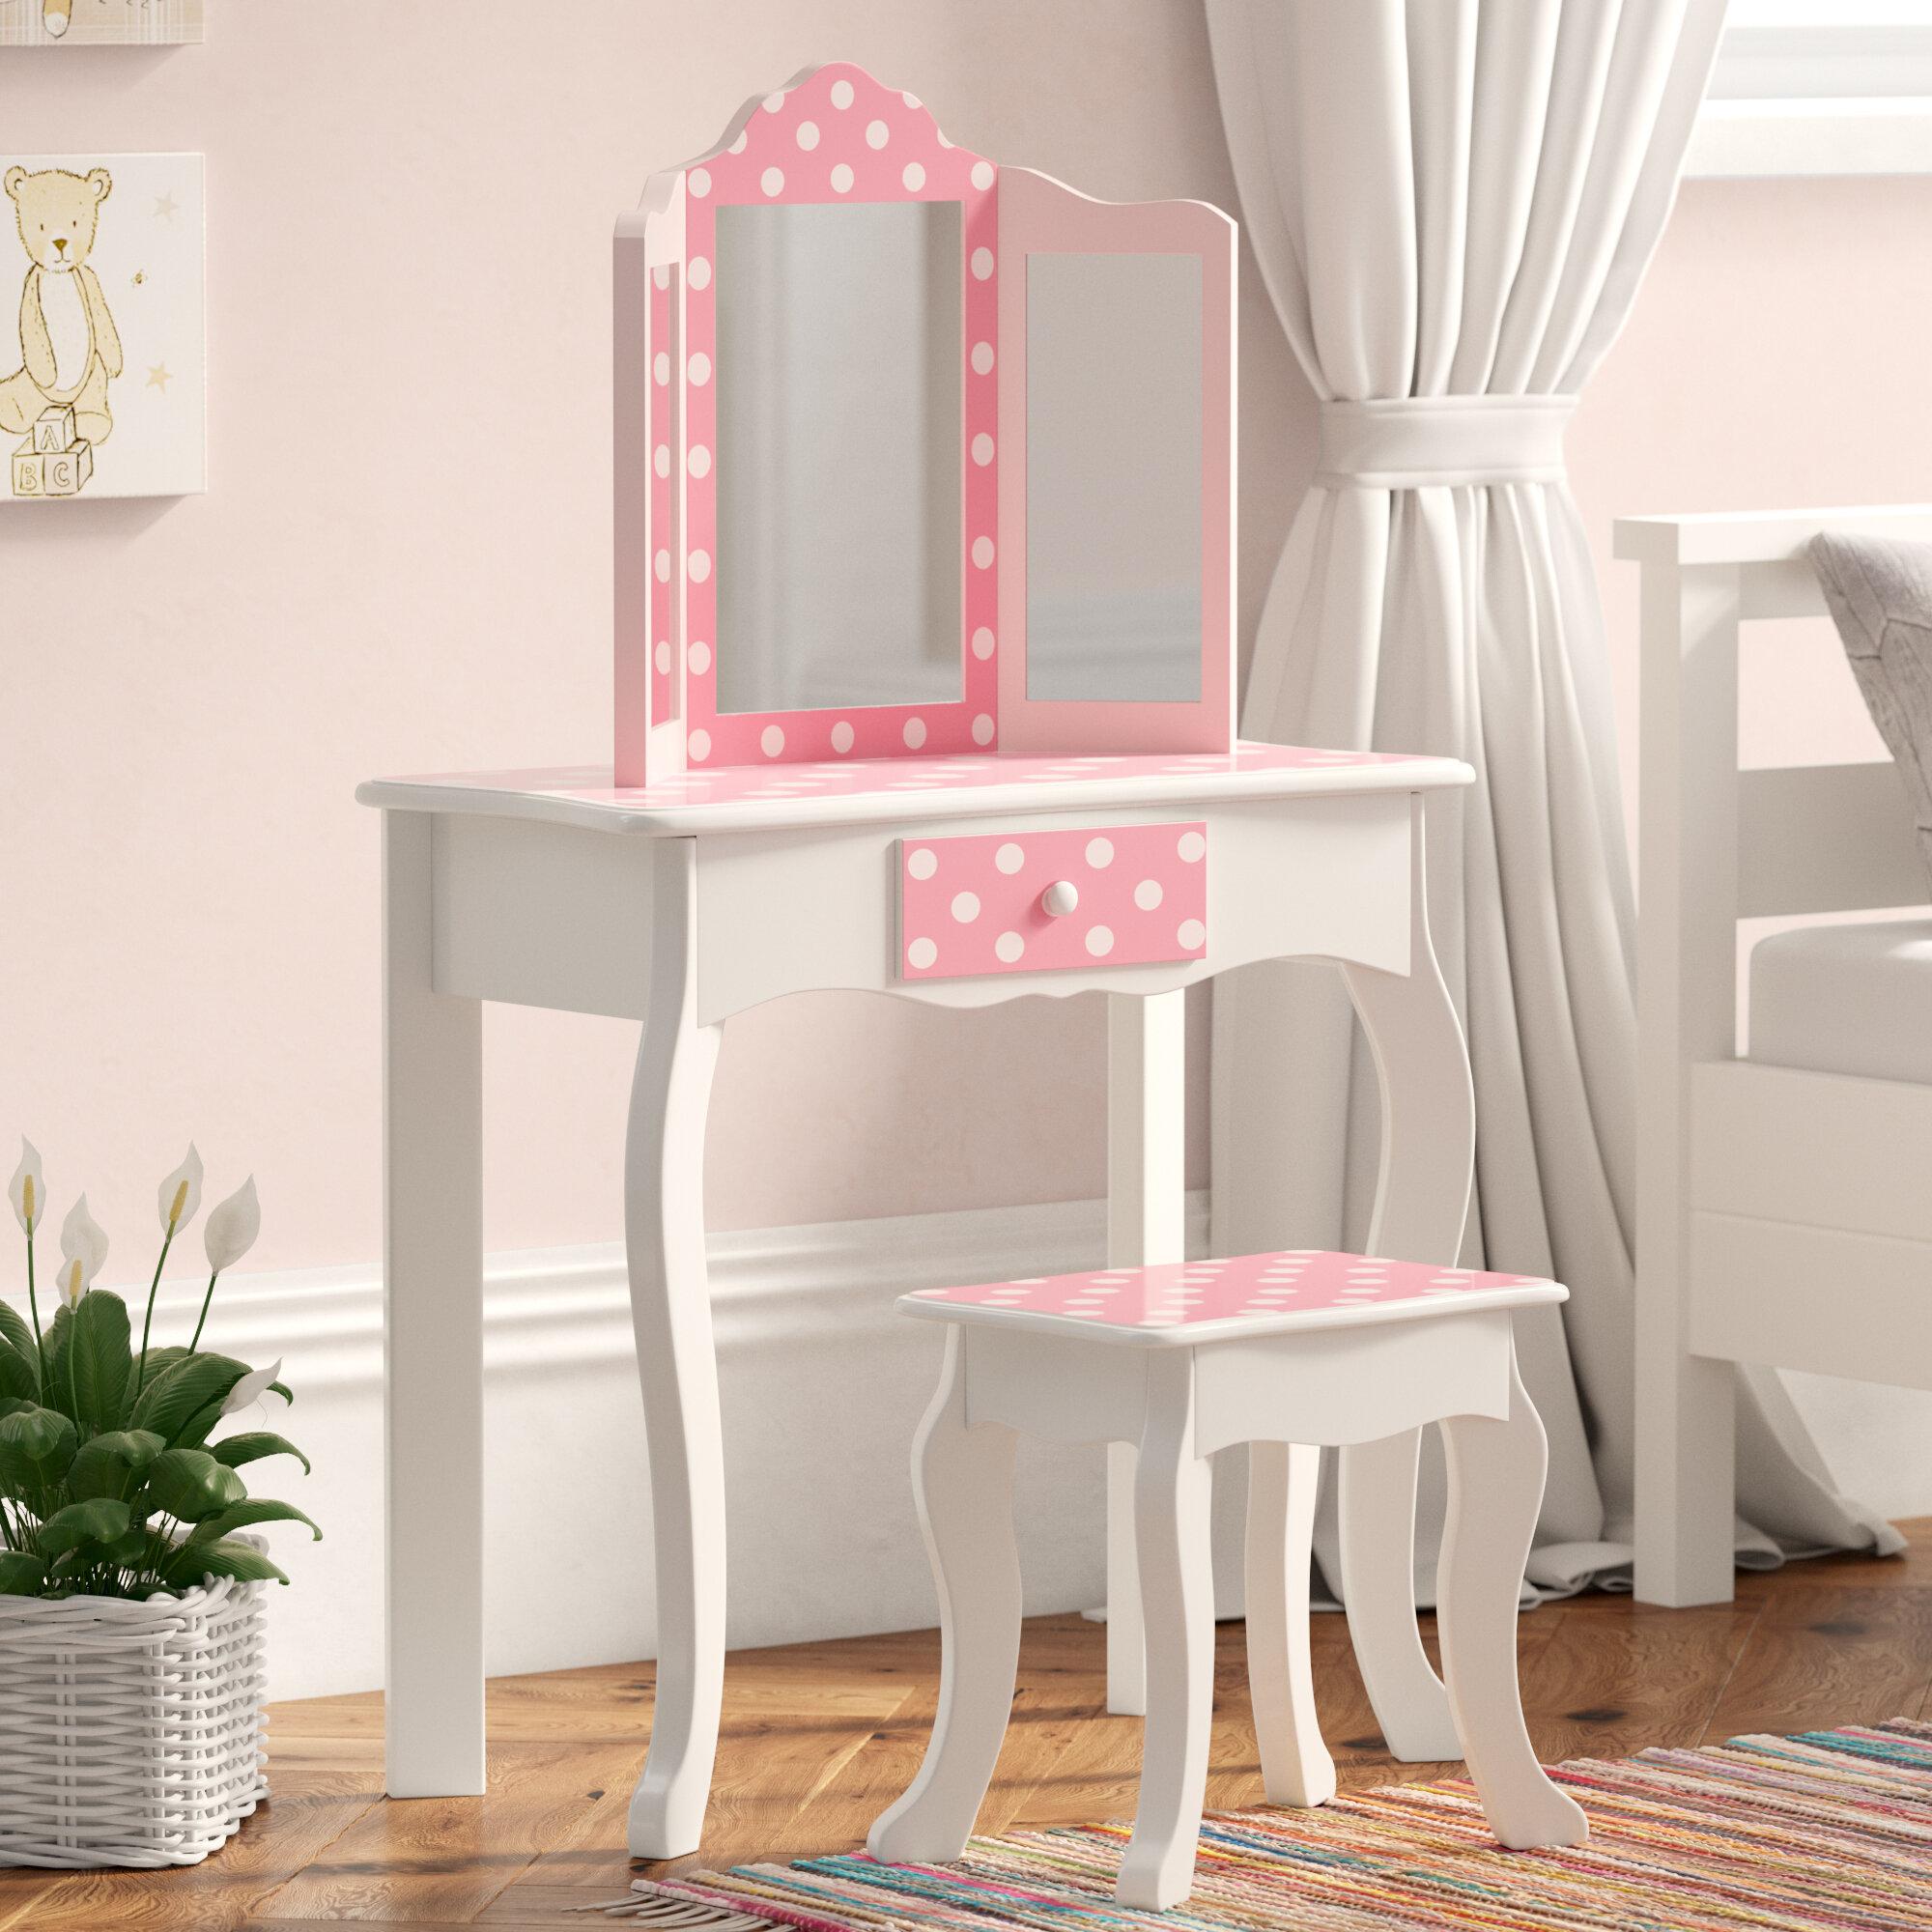 super popular a7d2d 20c30 Kadence Children's Wooden Vanity Dressing Table & Mirror Stool Set